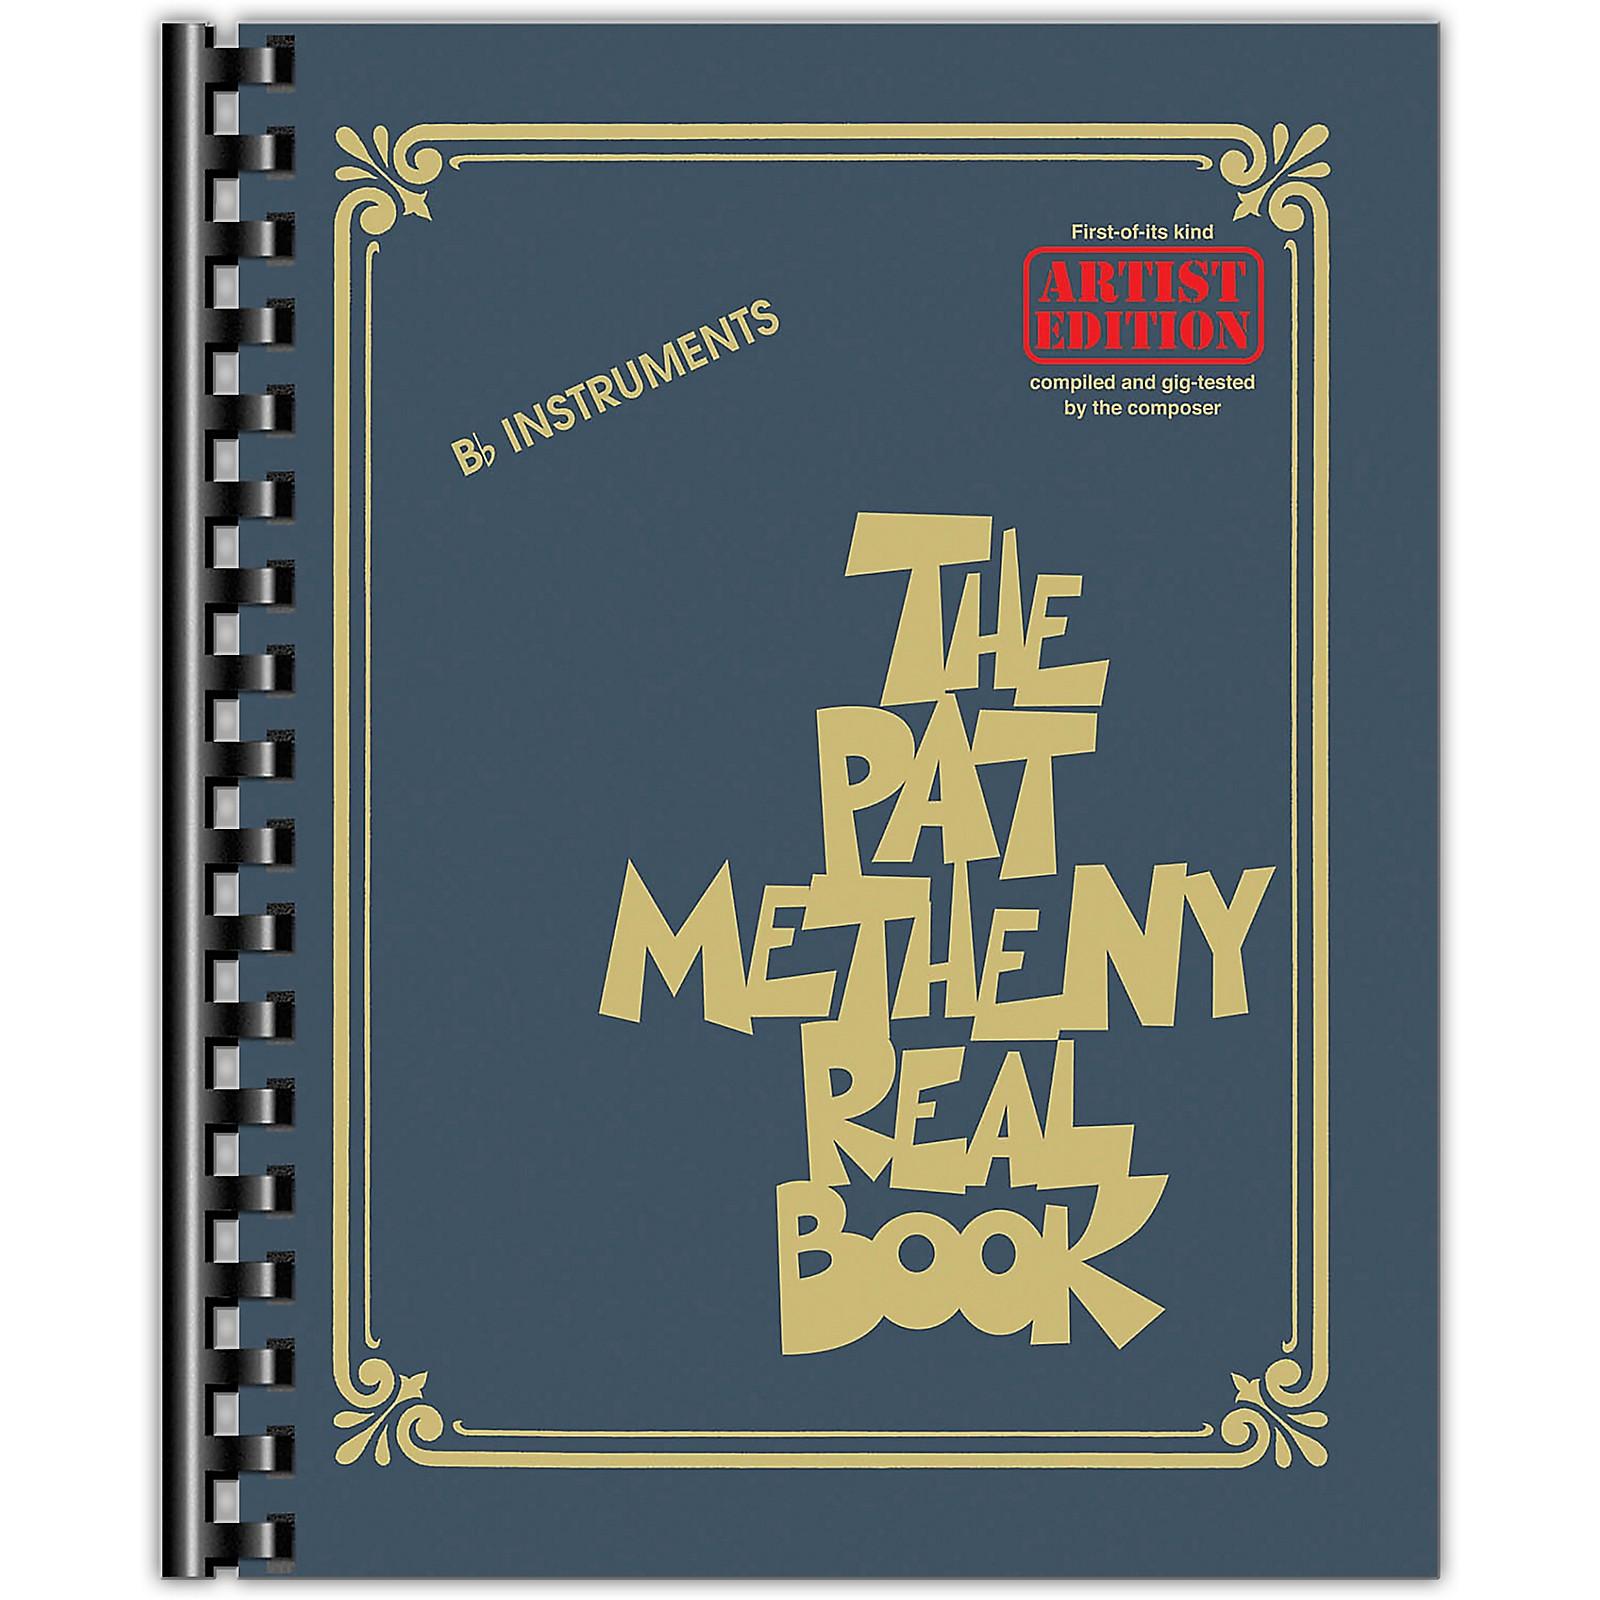 Hal Leonard The Pat Metheny Real Book (Artist Edition B-Flat Instruments) Fake Book